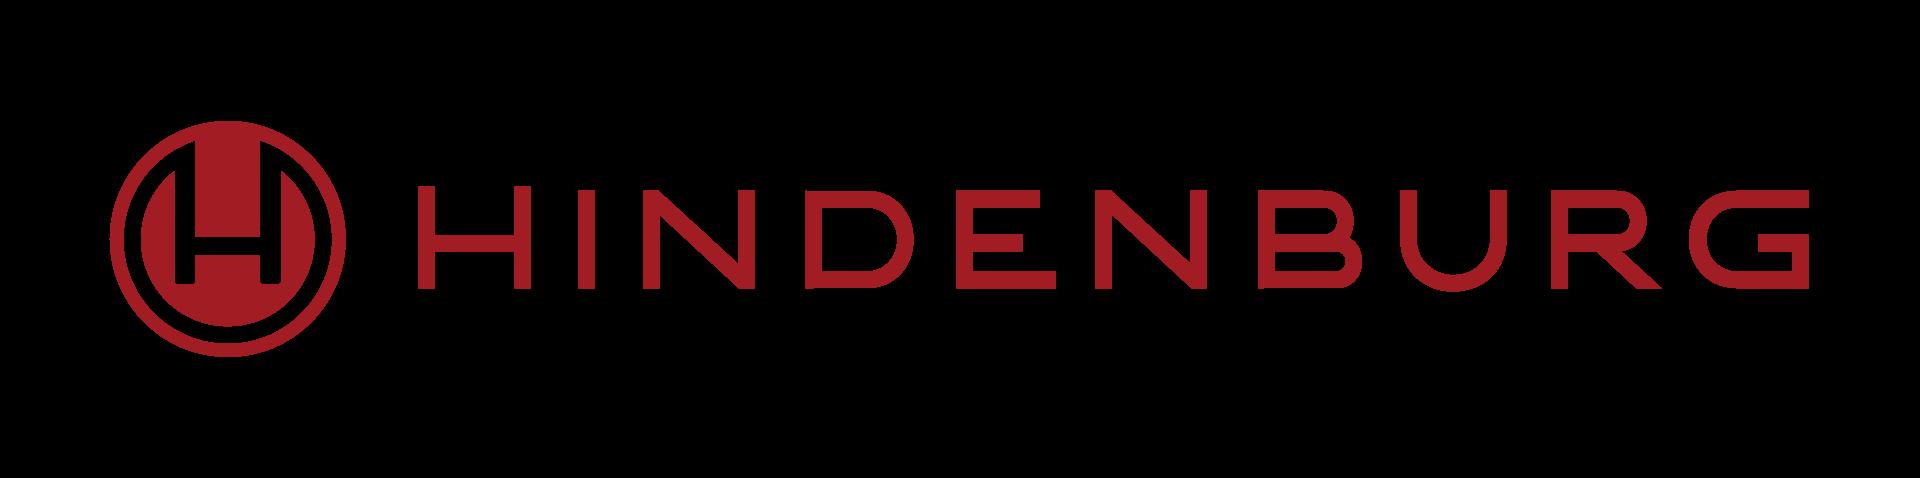 Hindenberg